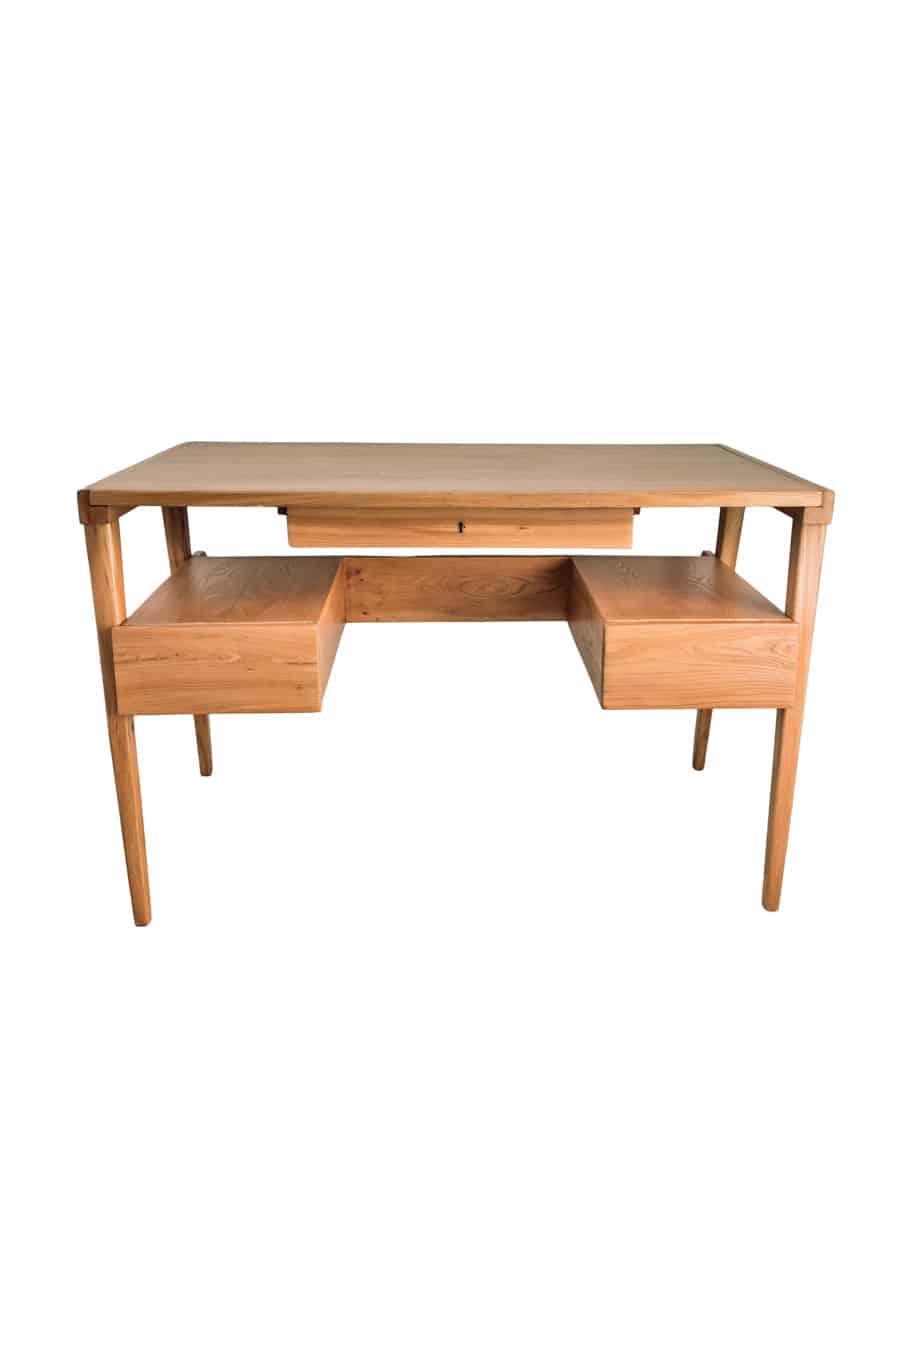 Desk designed by H. Lachert for ŁAD Cooperative